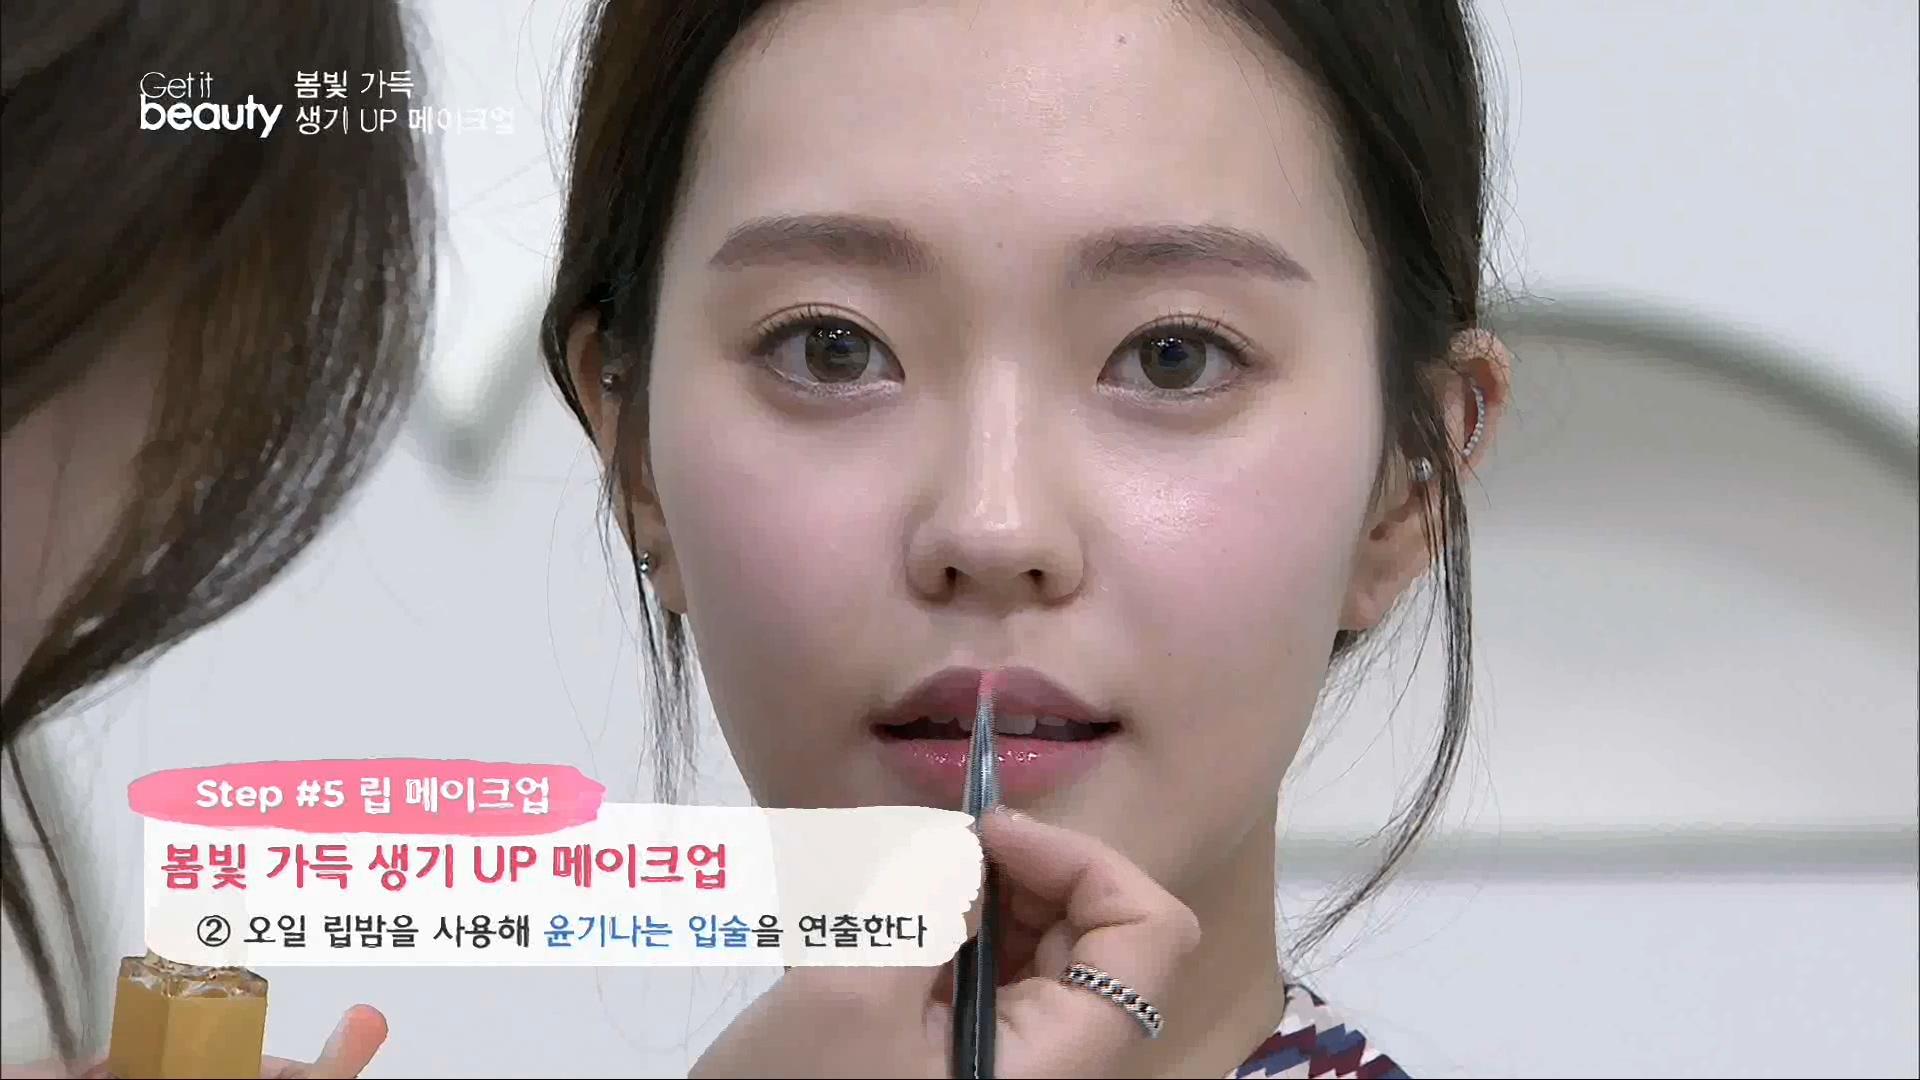 STEP#5.립 메이크업 2.오일 립밤을 사용해 윤기나는 입술을 연출한다.